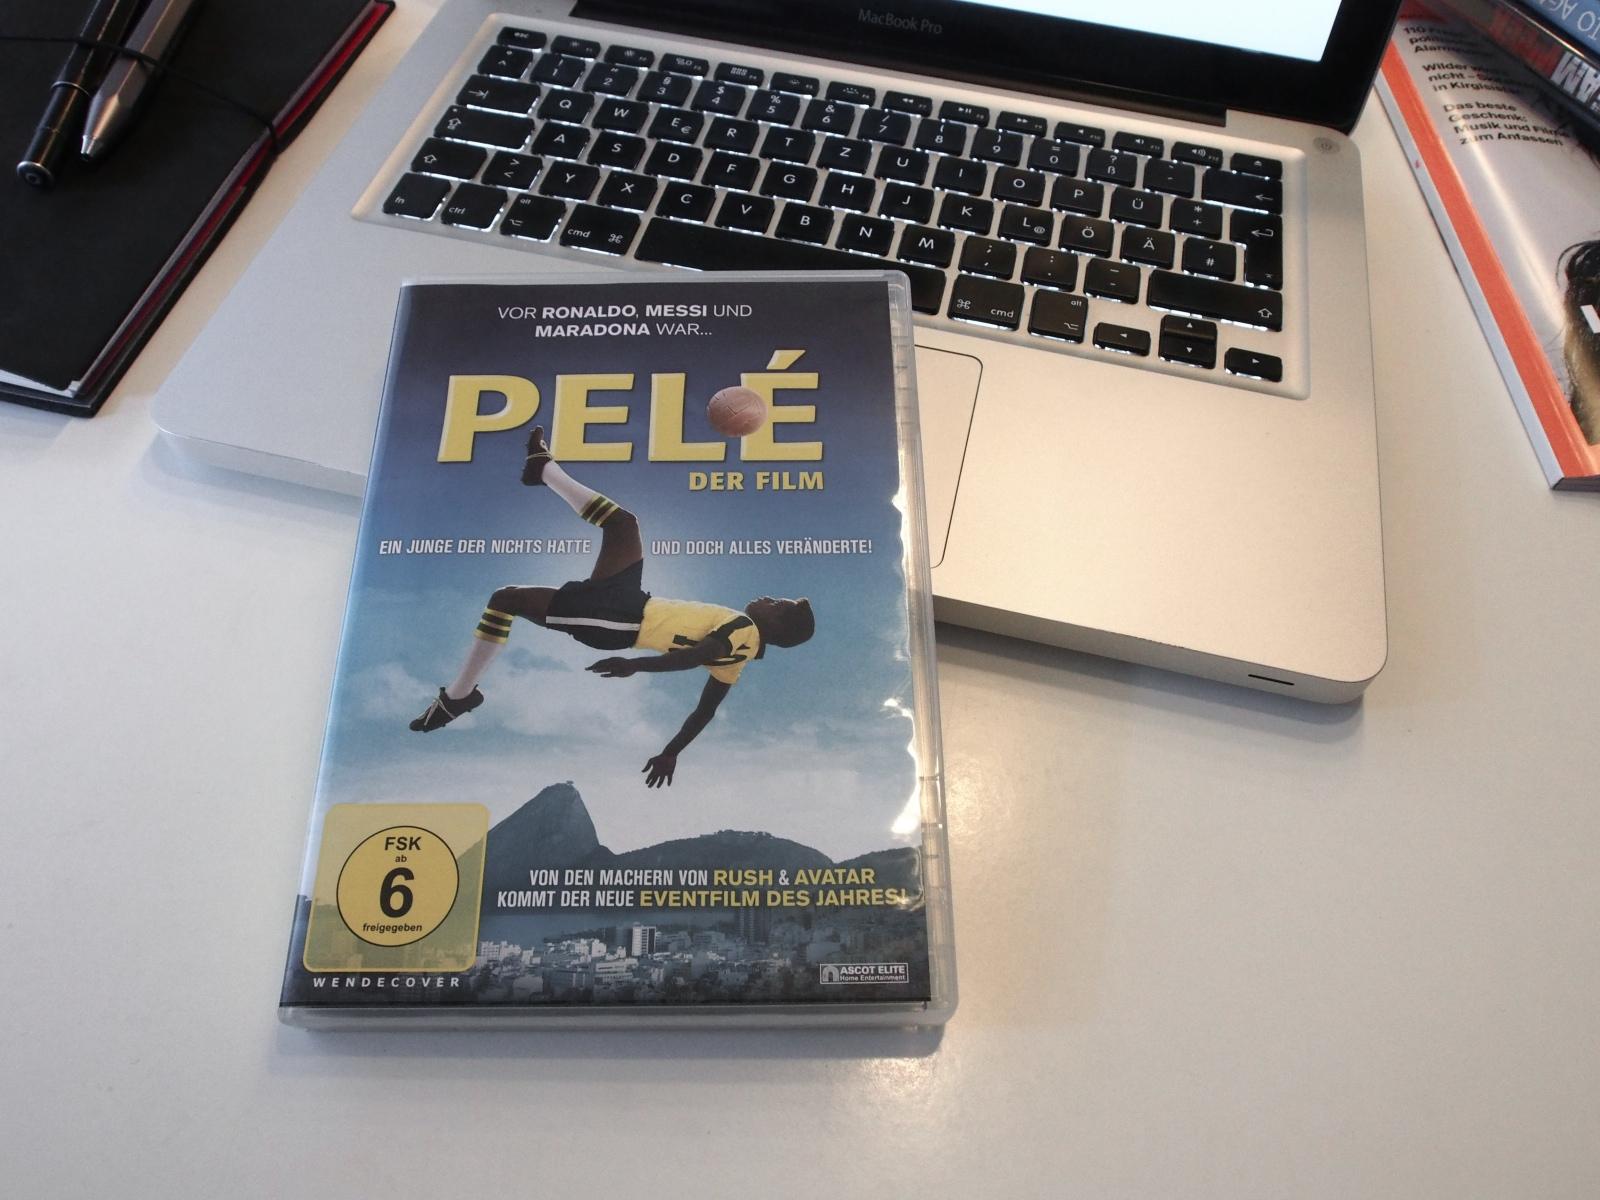 Pele - Fotodinge